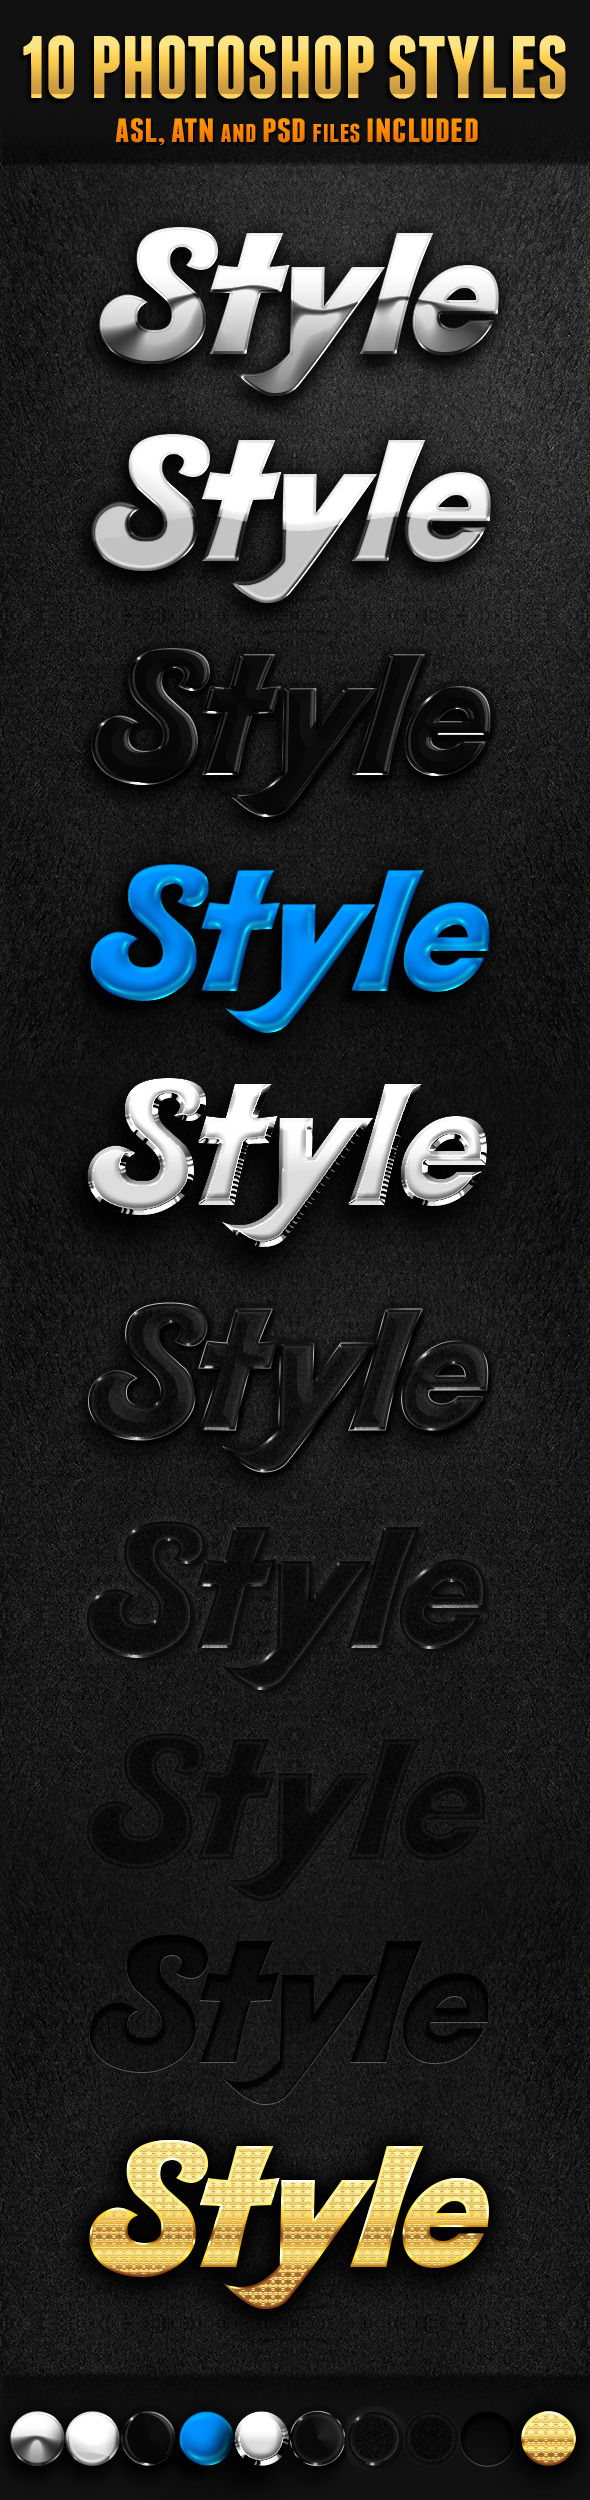 10 Photoshop Styles